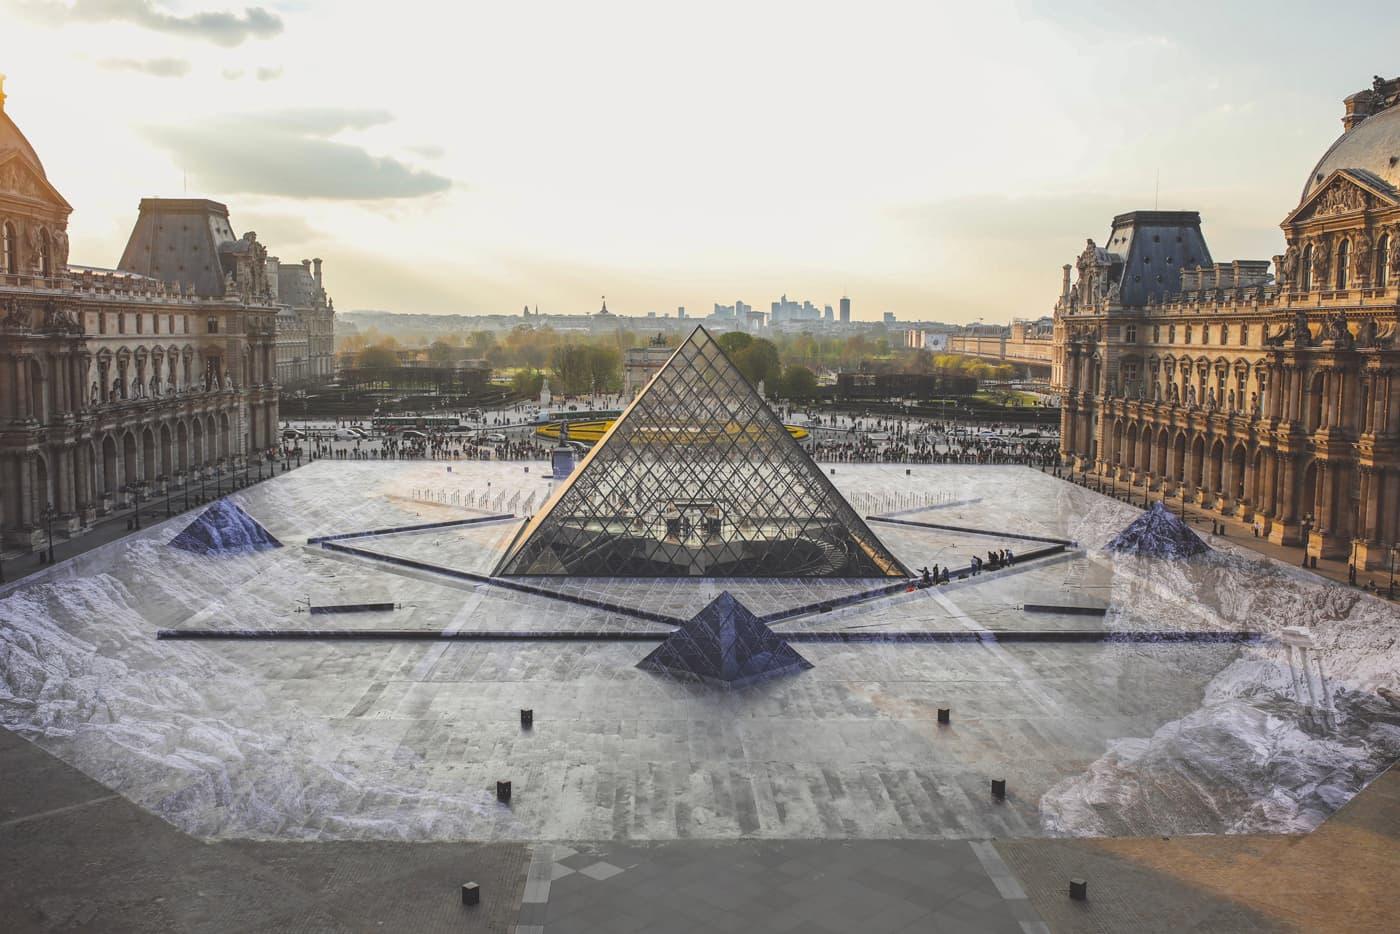 French Artist JR Transforms Musée du Louvre With Massive Optical Illusion